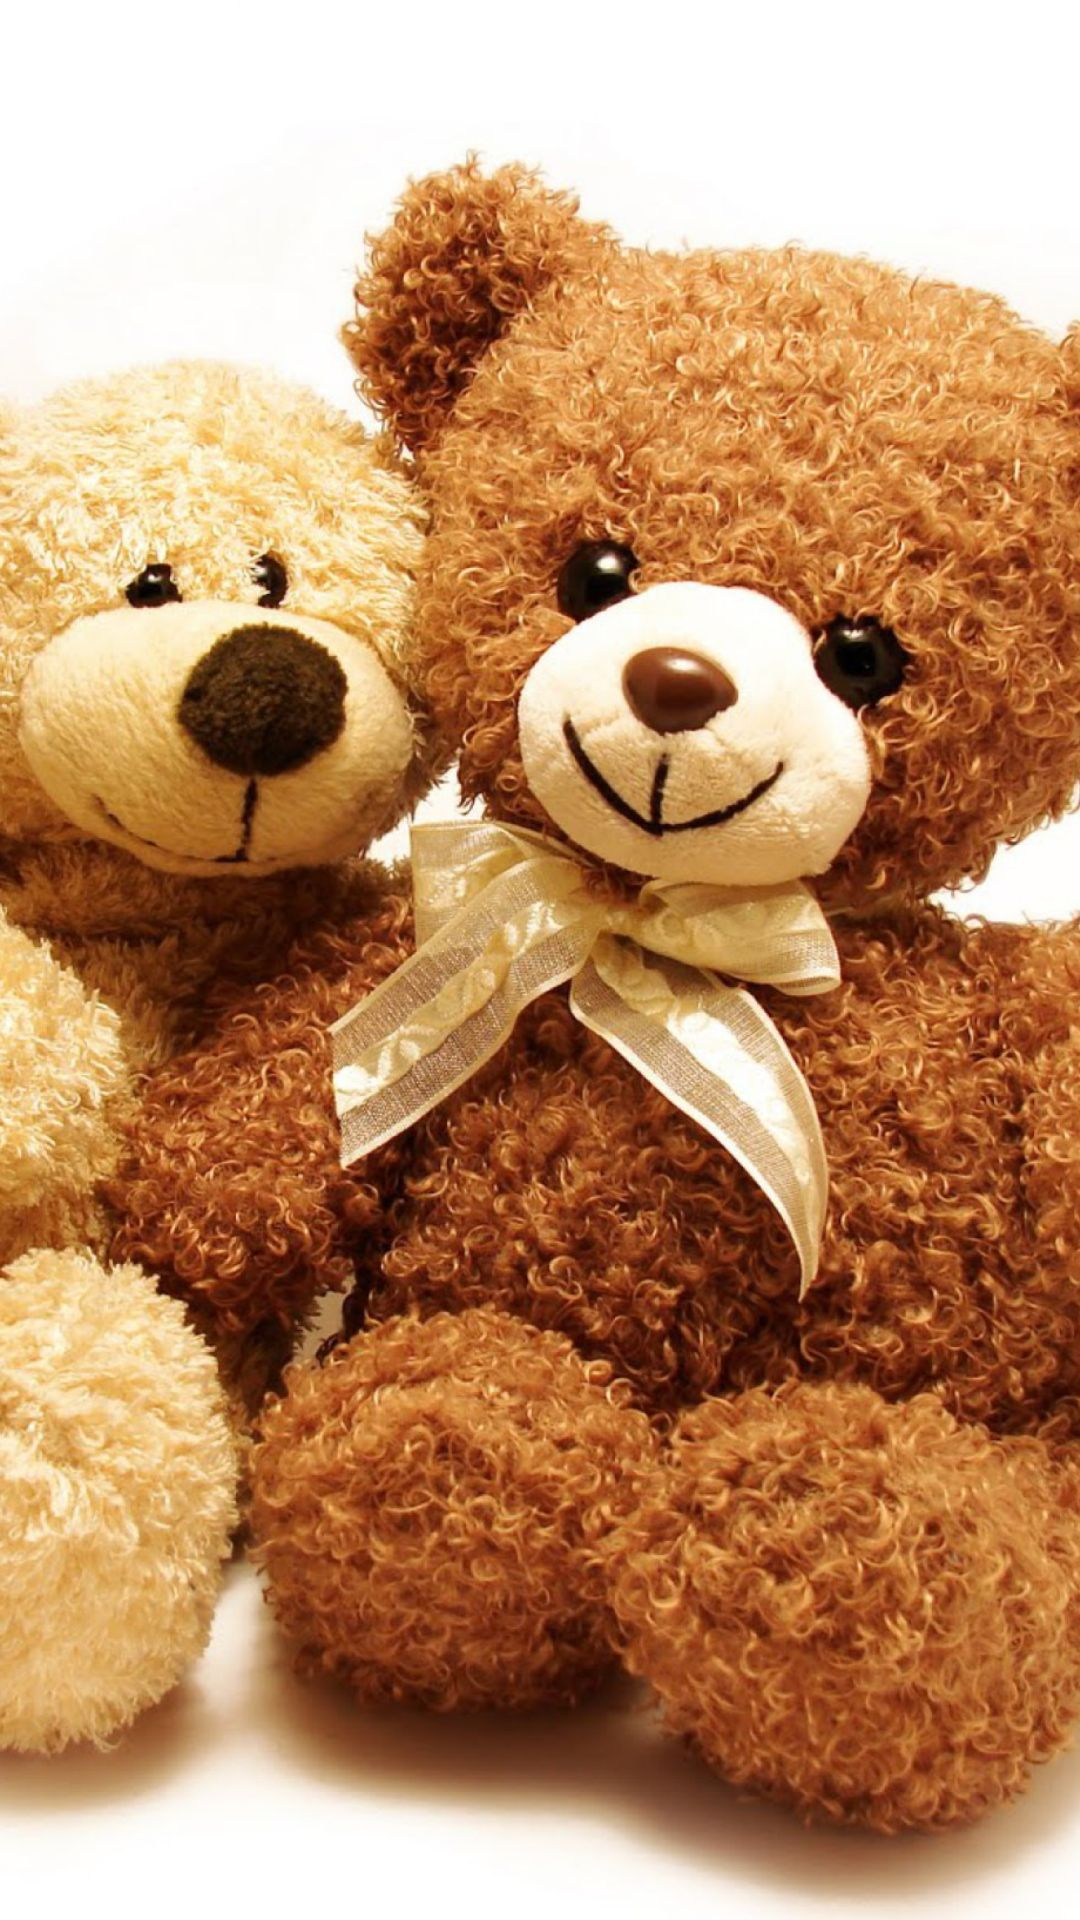 Valentine Teddy Bear Hug Wallpaper For Nokia Lumia